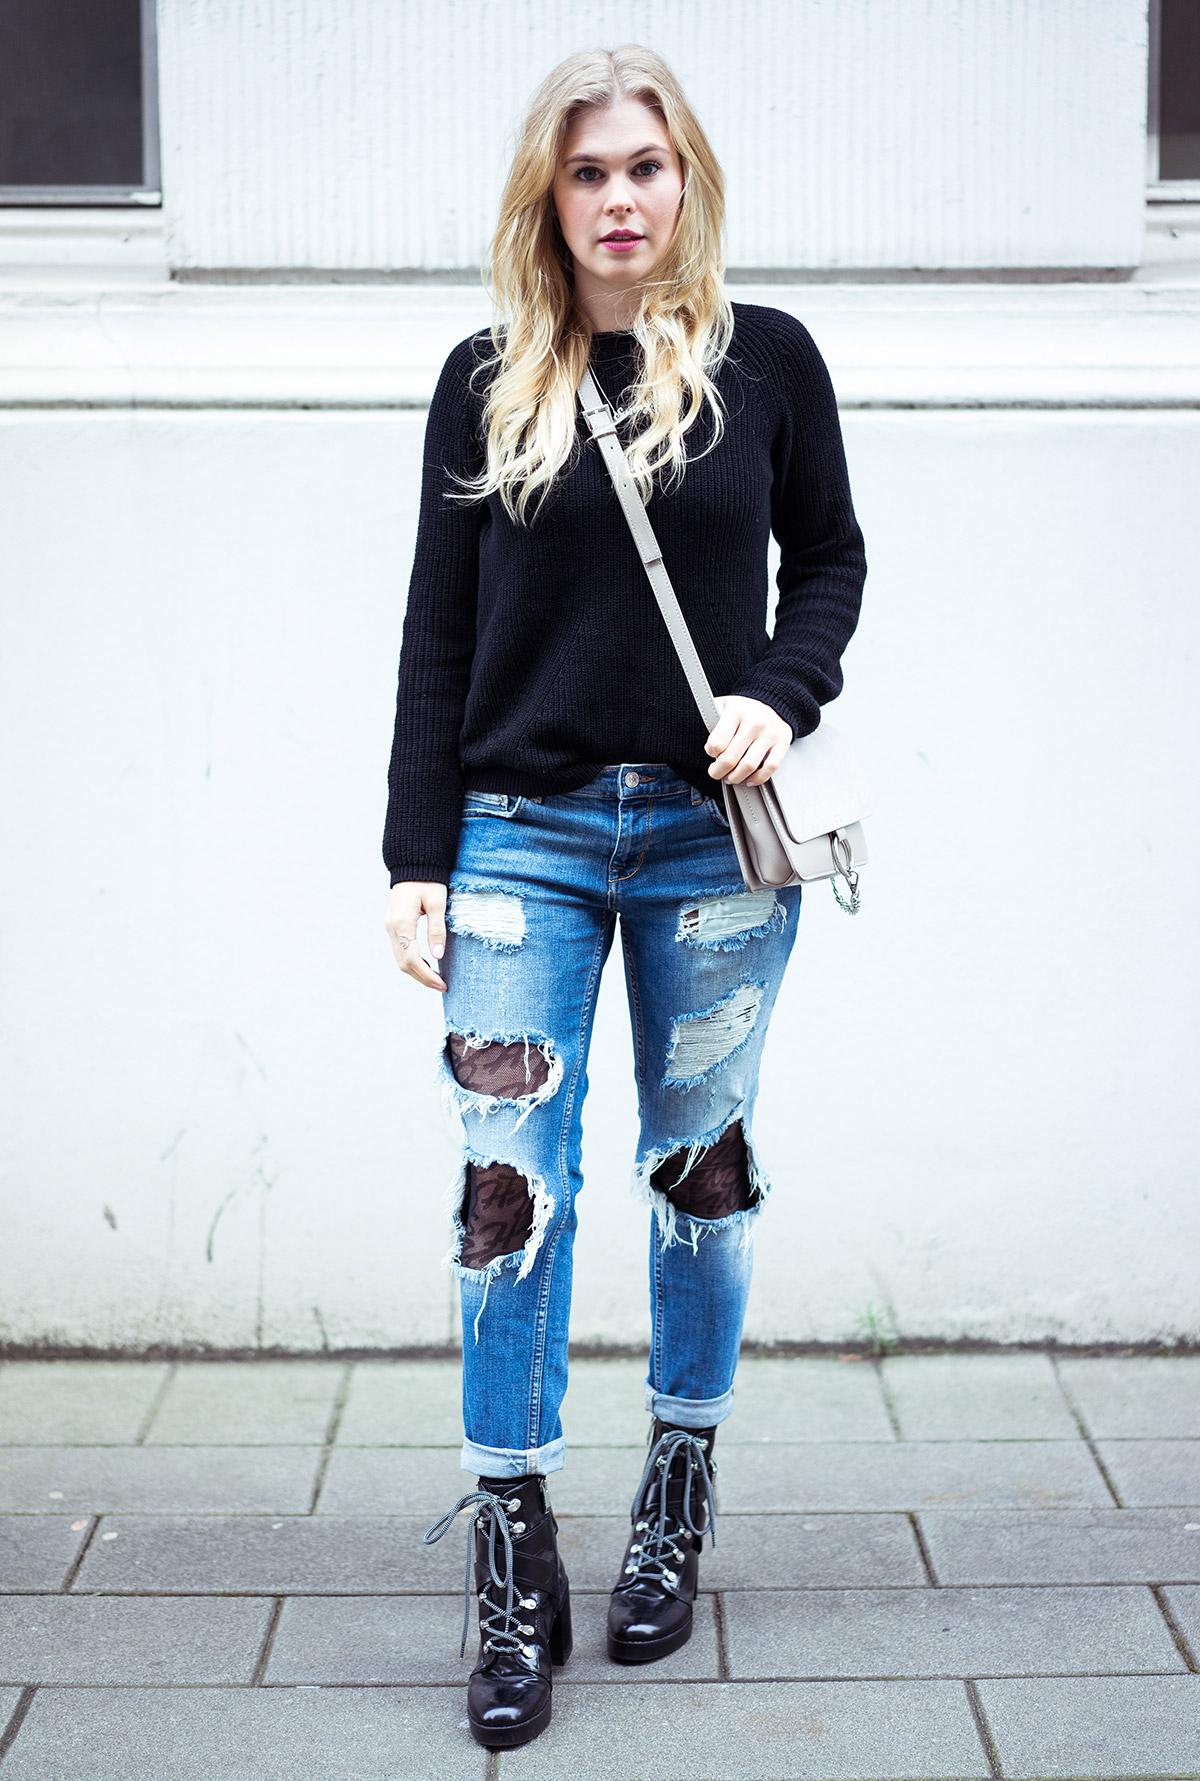 Strumpfhose und RIpped Jeans